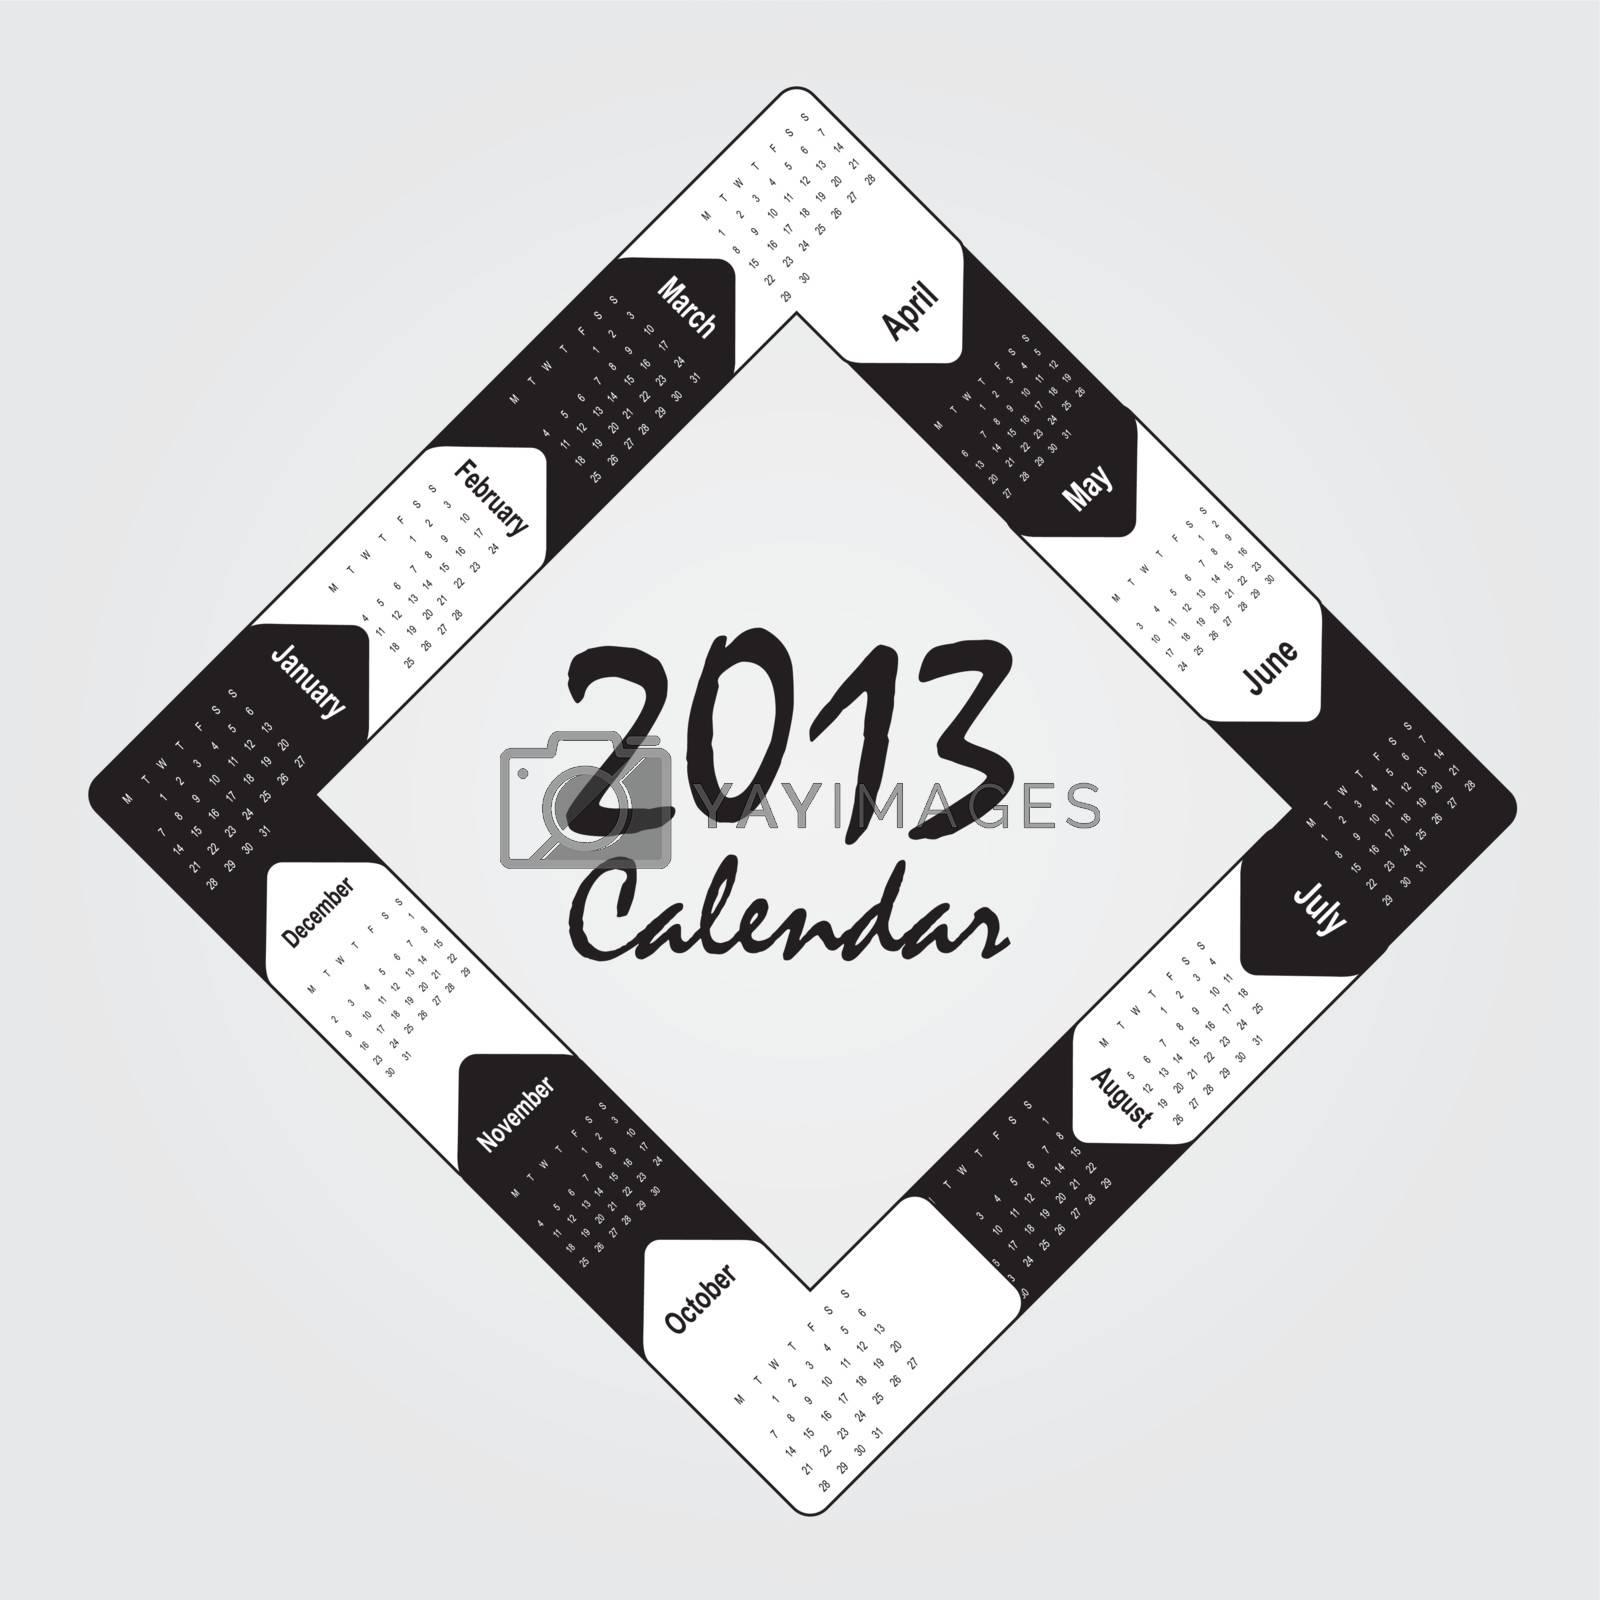 black and white 2013 calendar over white background